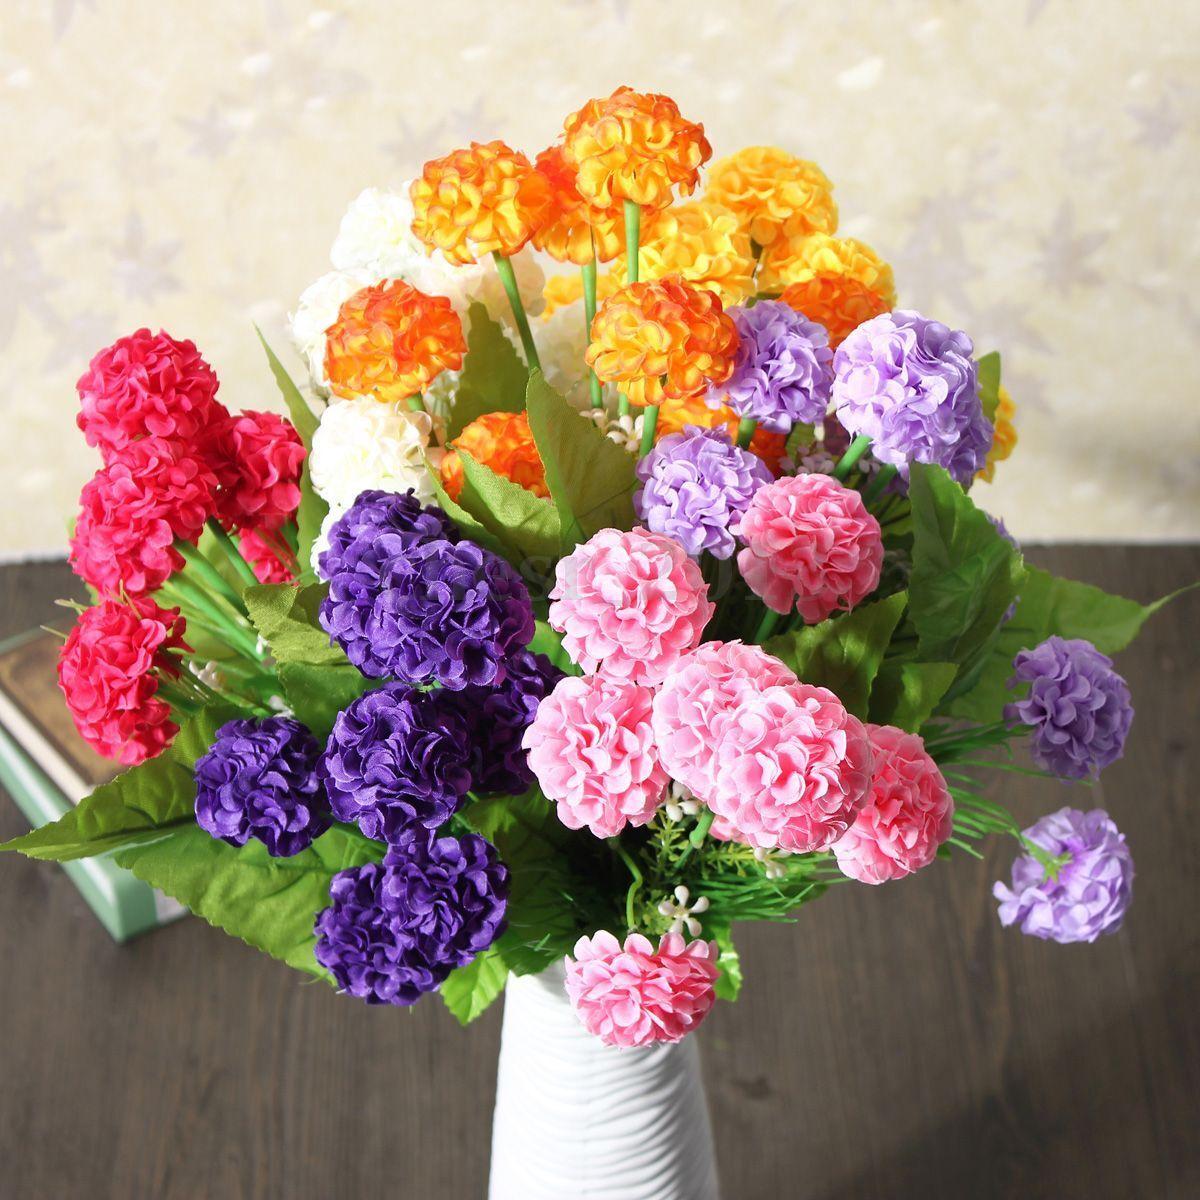 Home Decoration - 1 Bunch Wedding Artificial Silk Hydrangea Posy Flower Bouquet Home Party Decor